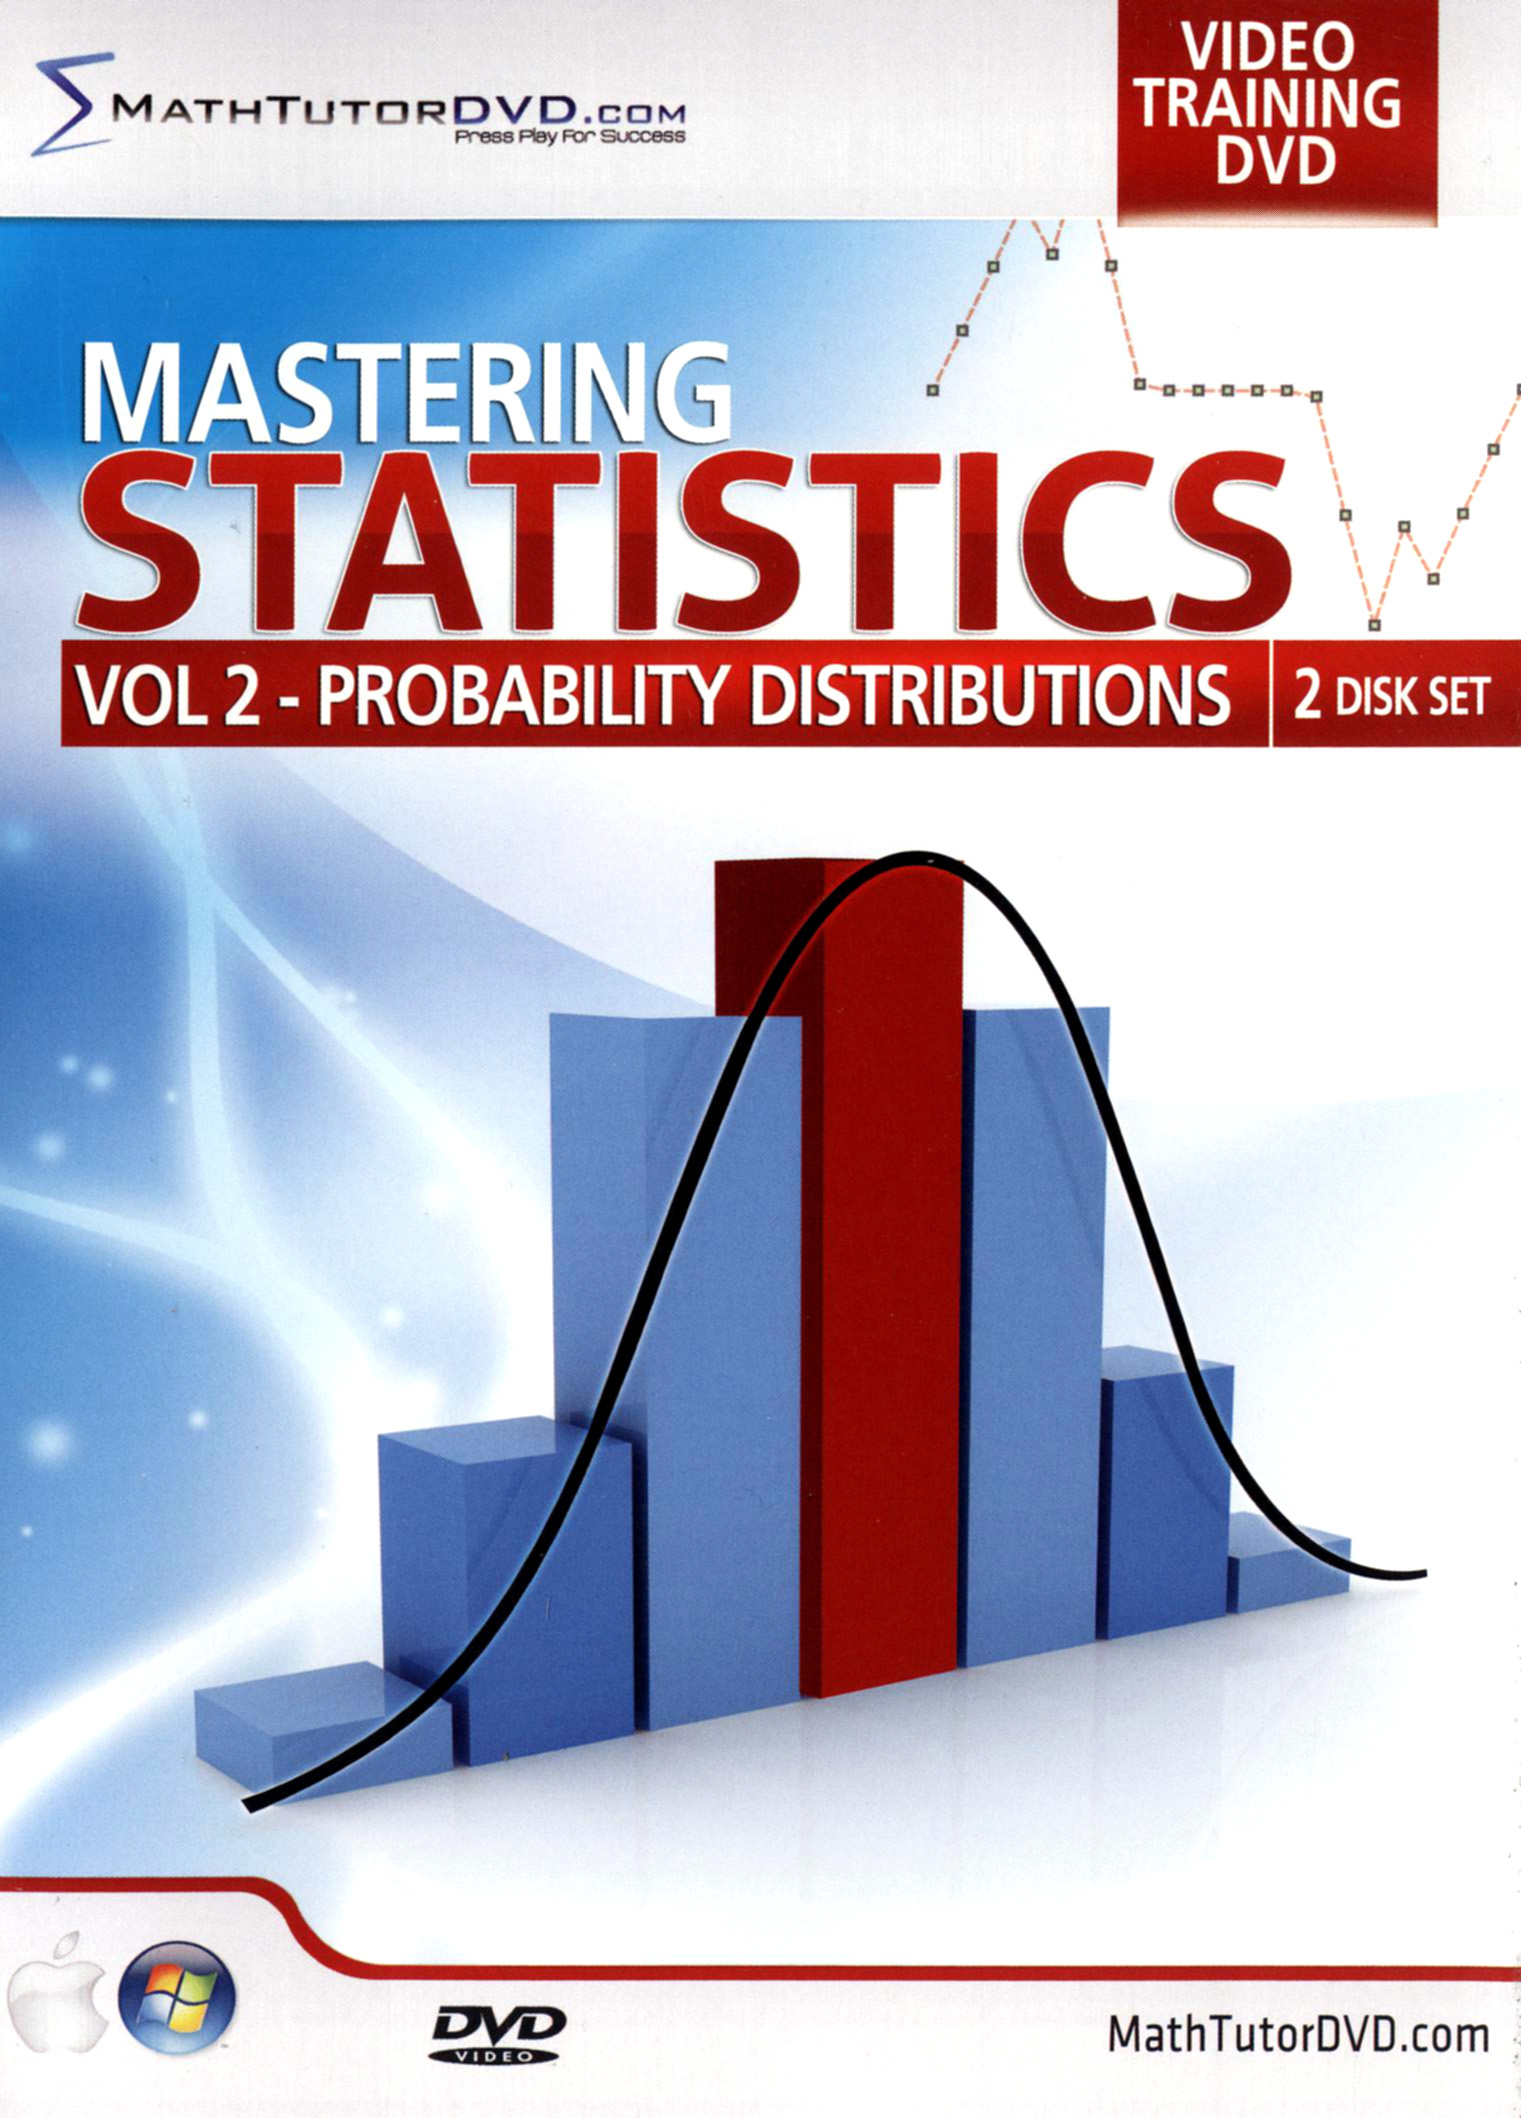 Mastering Statistics, Vol. 2: Probability Distributions